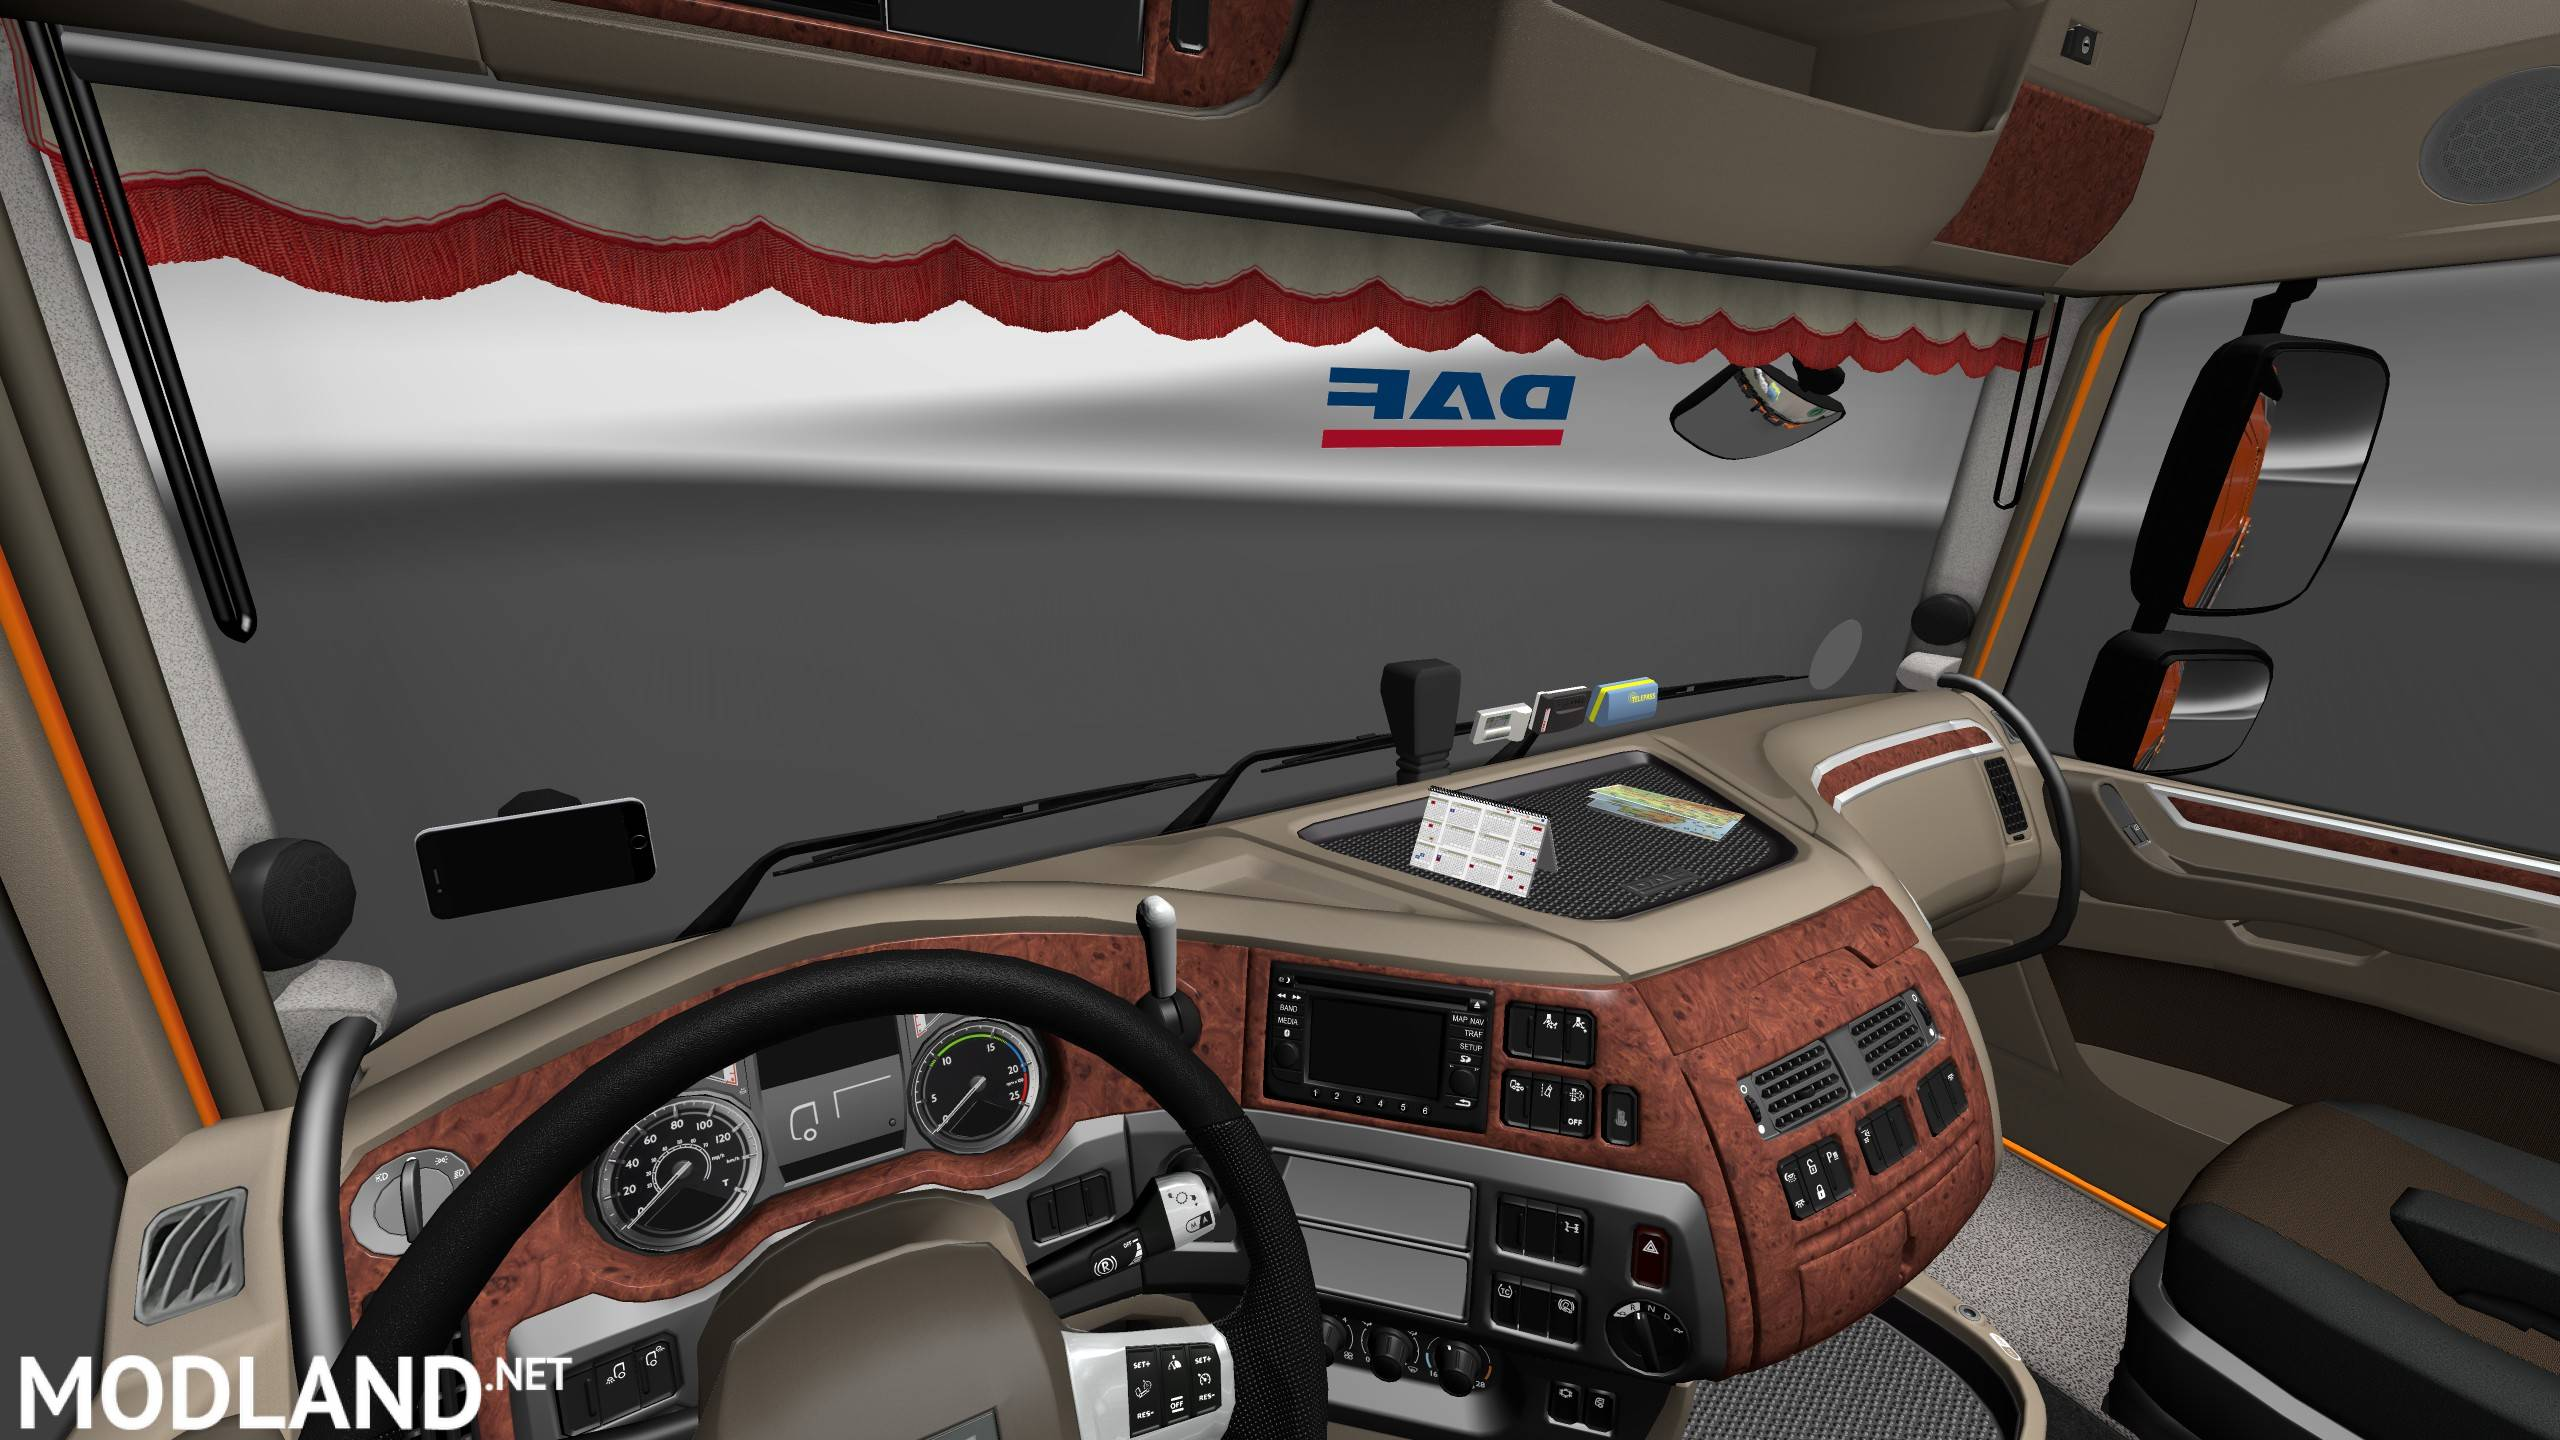 https://www.modland.net/uploads/images/euro-truck-simulator-2/interiors/2015-12-27_00005_ModLandNet.jpg